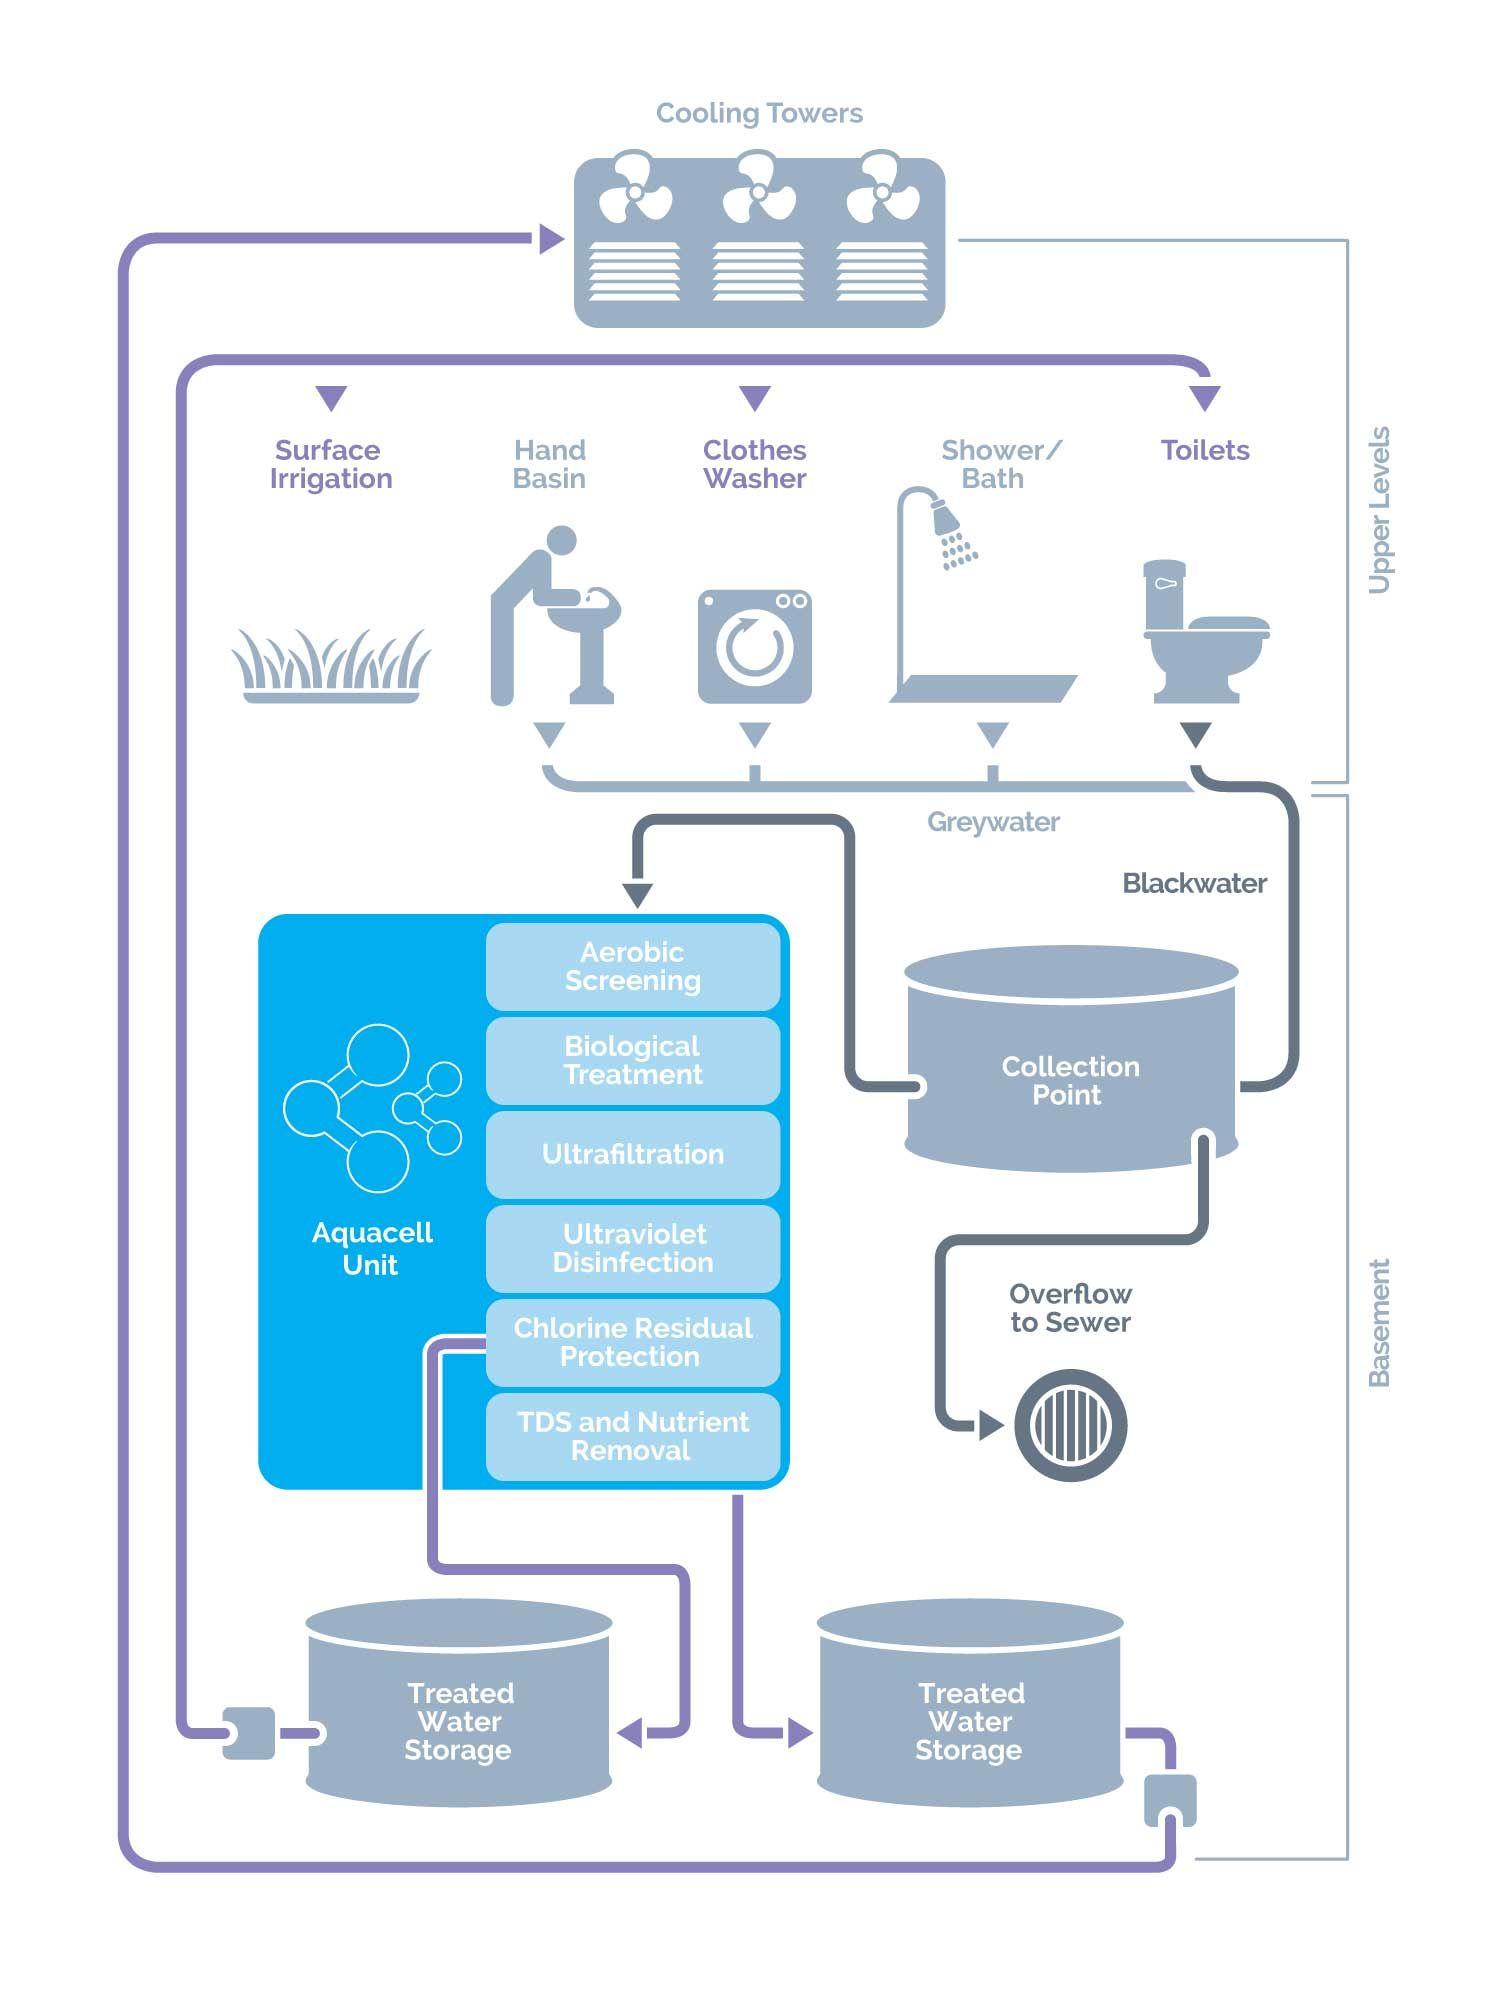 Aquacell_Blackwater System & Blackwater Recycling | PHOENIX Process Equipment Company | water